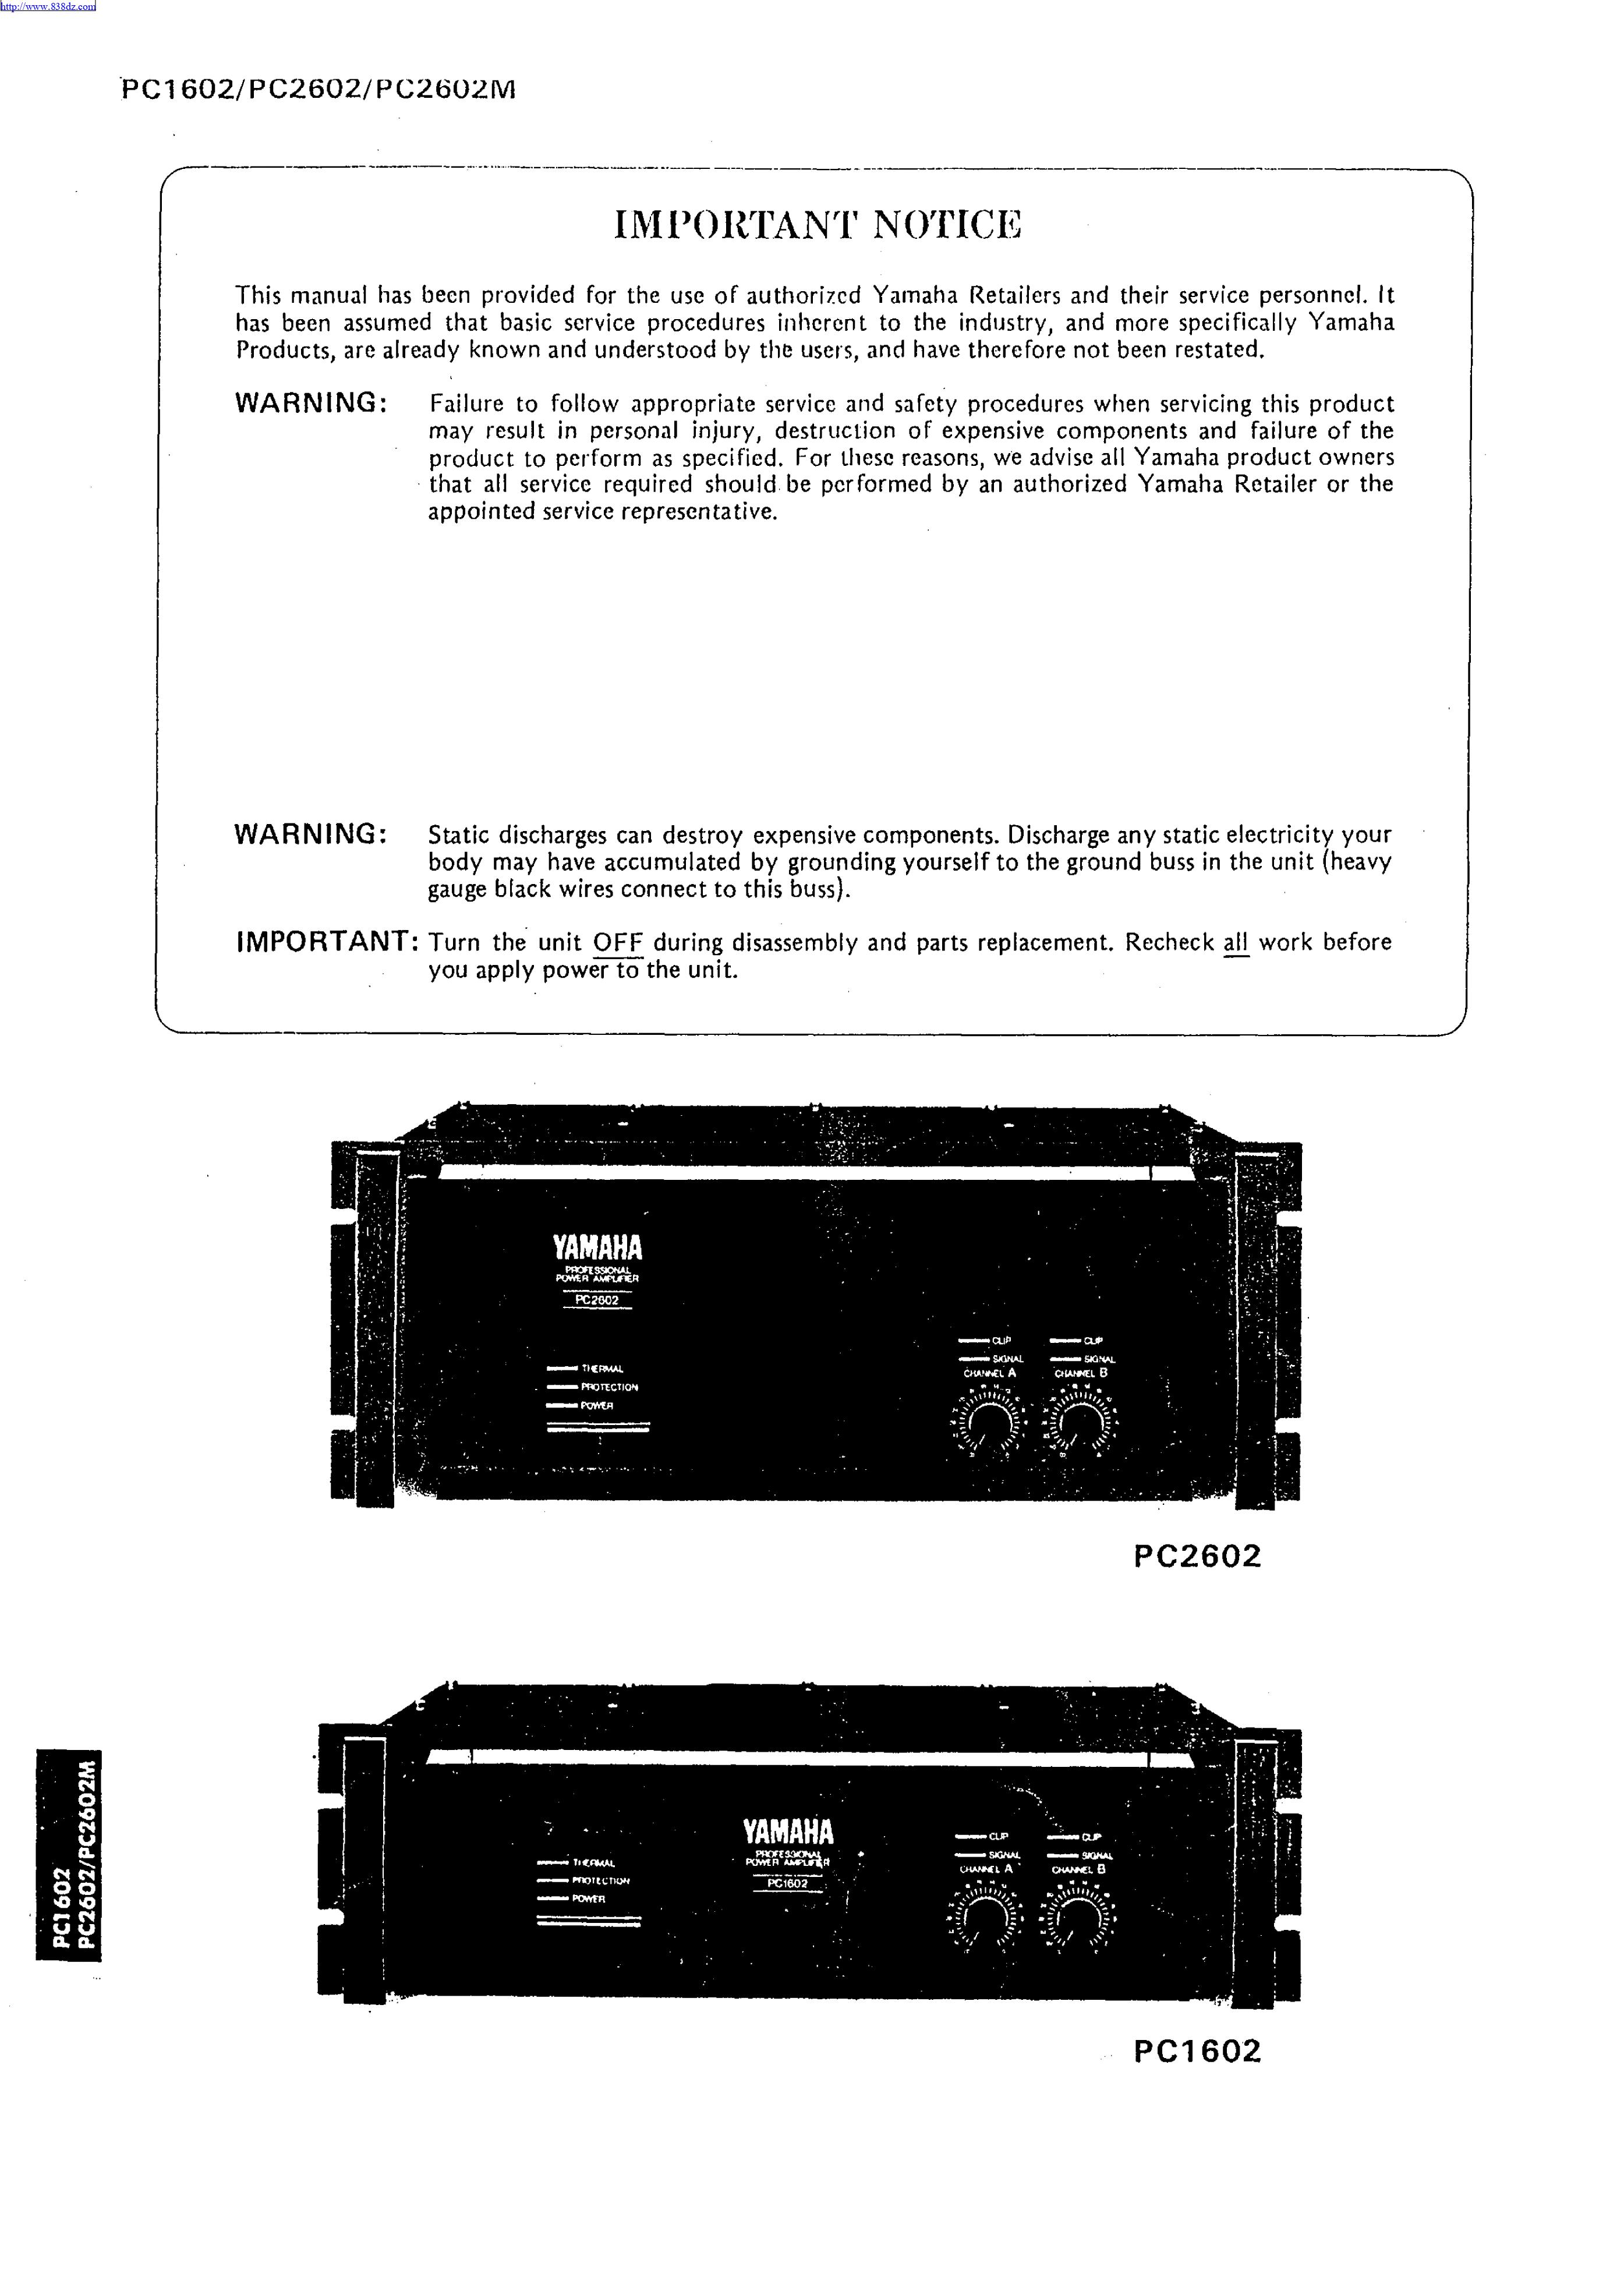 Yamaha 雅马哈 PC1602 功放维修图纸